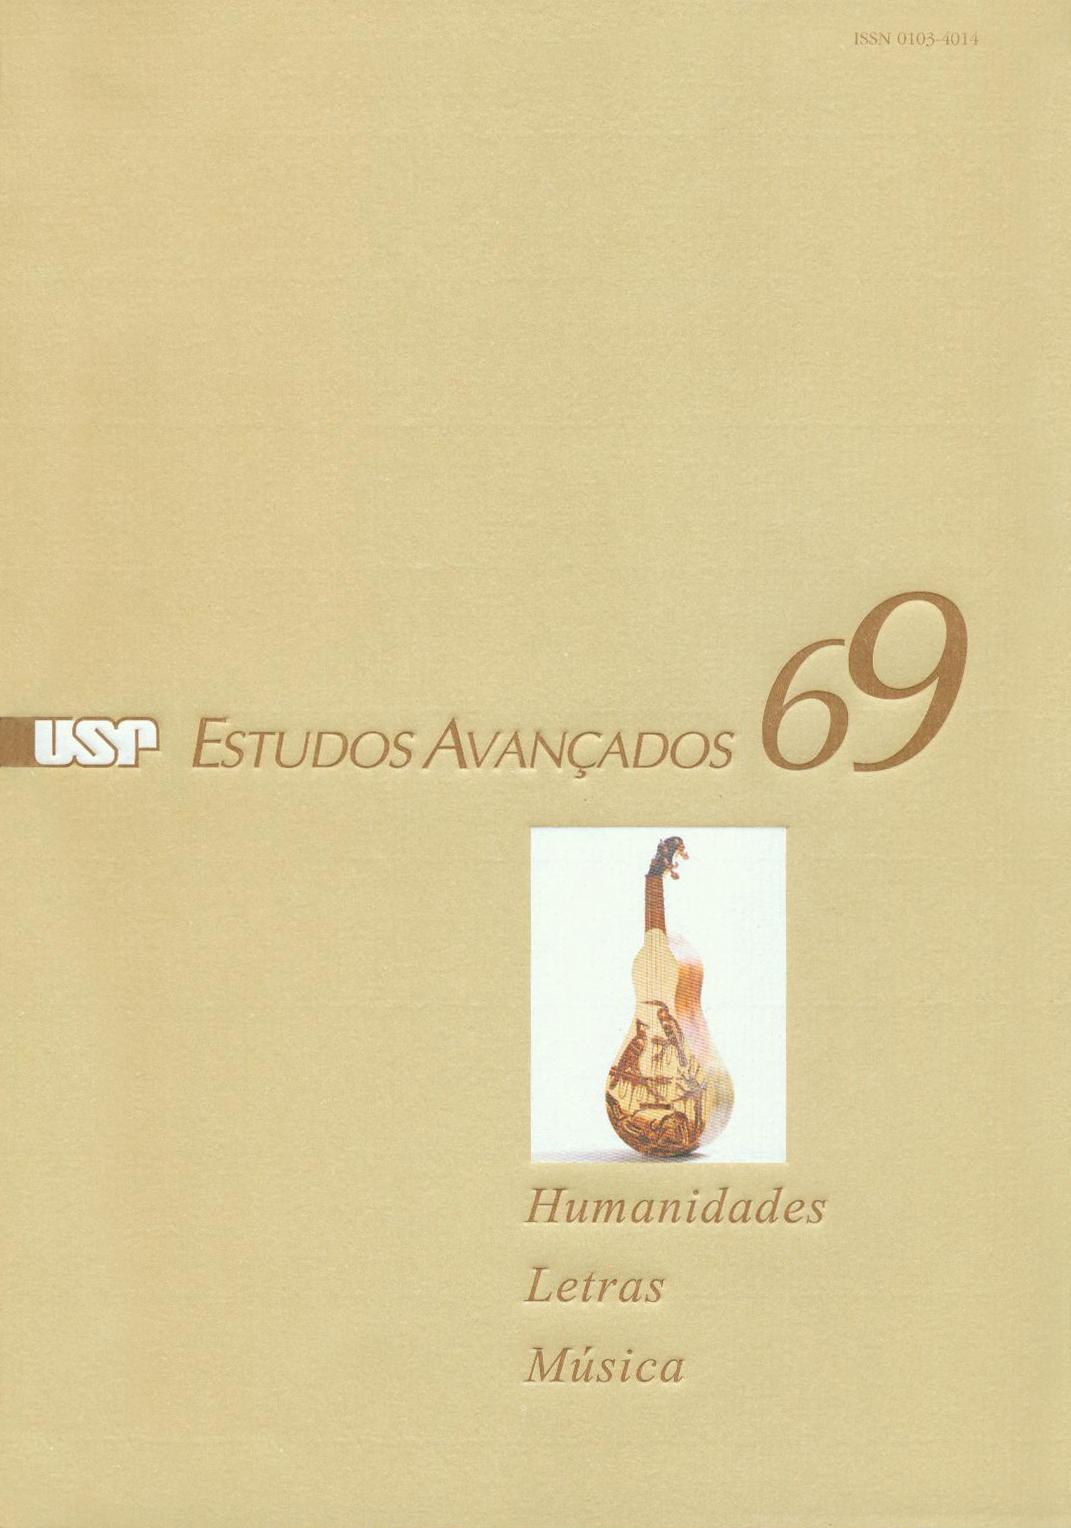 Visualizar v. 24 n. 69 (2010)